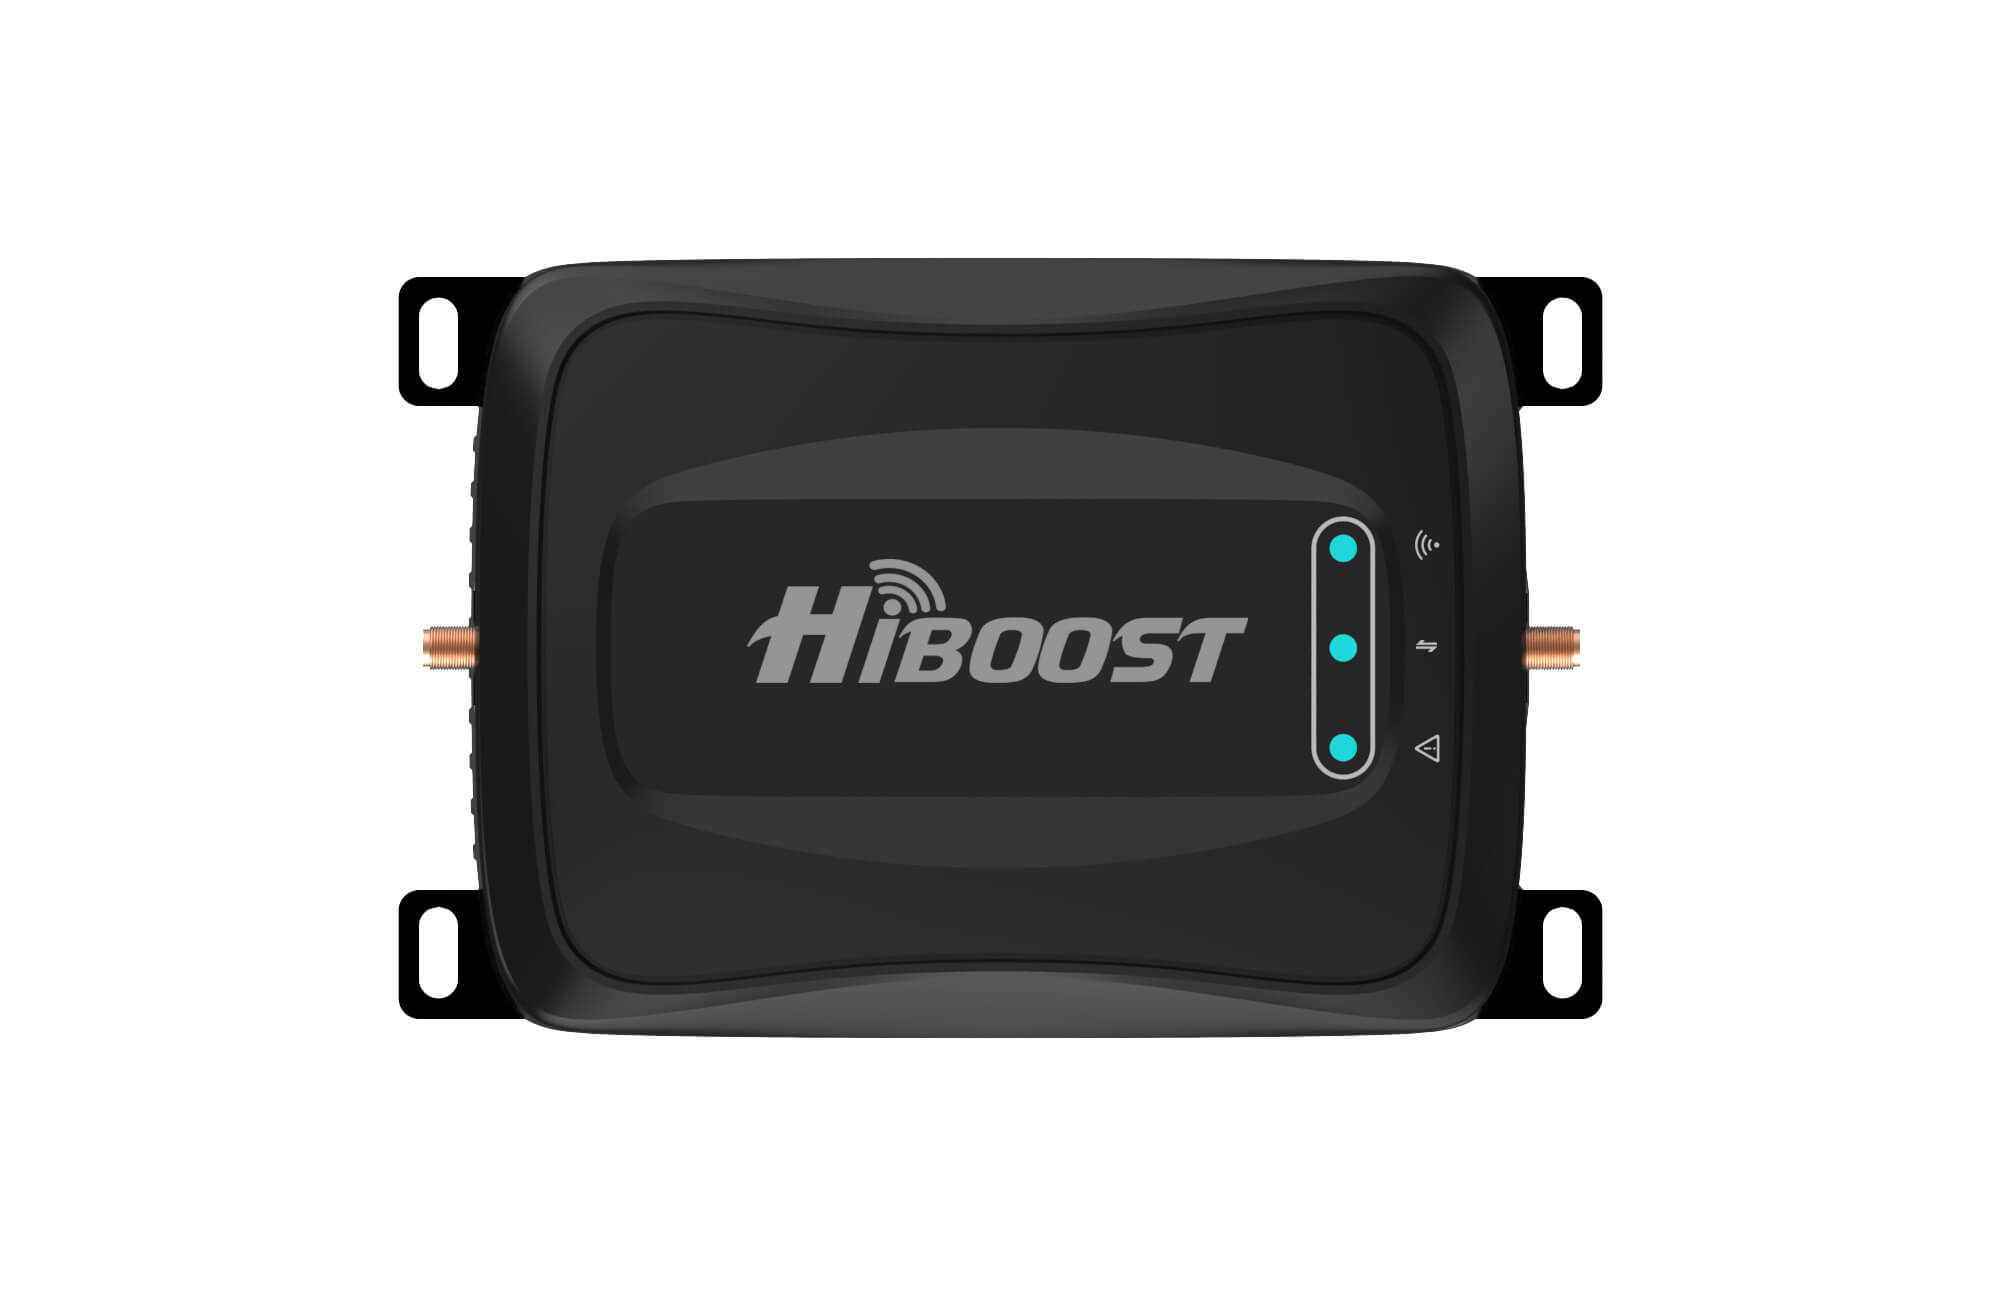 Hiboost-travel-4G-2.0-truck-booster-1